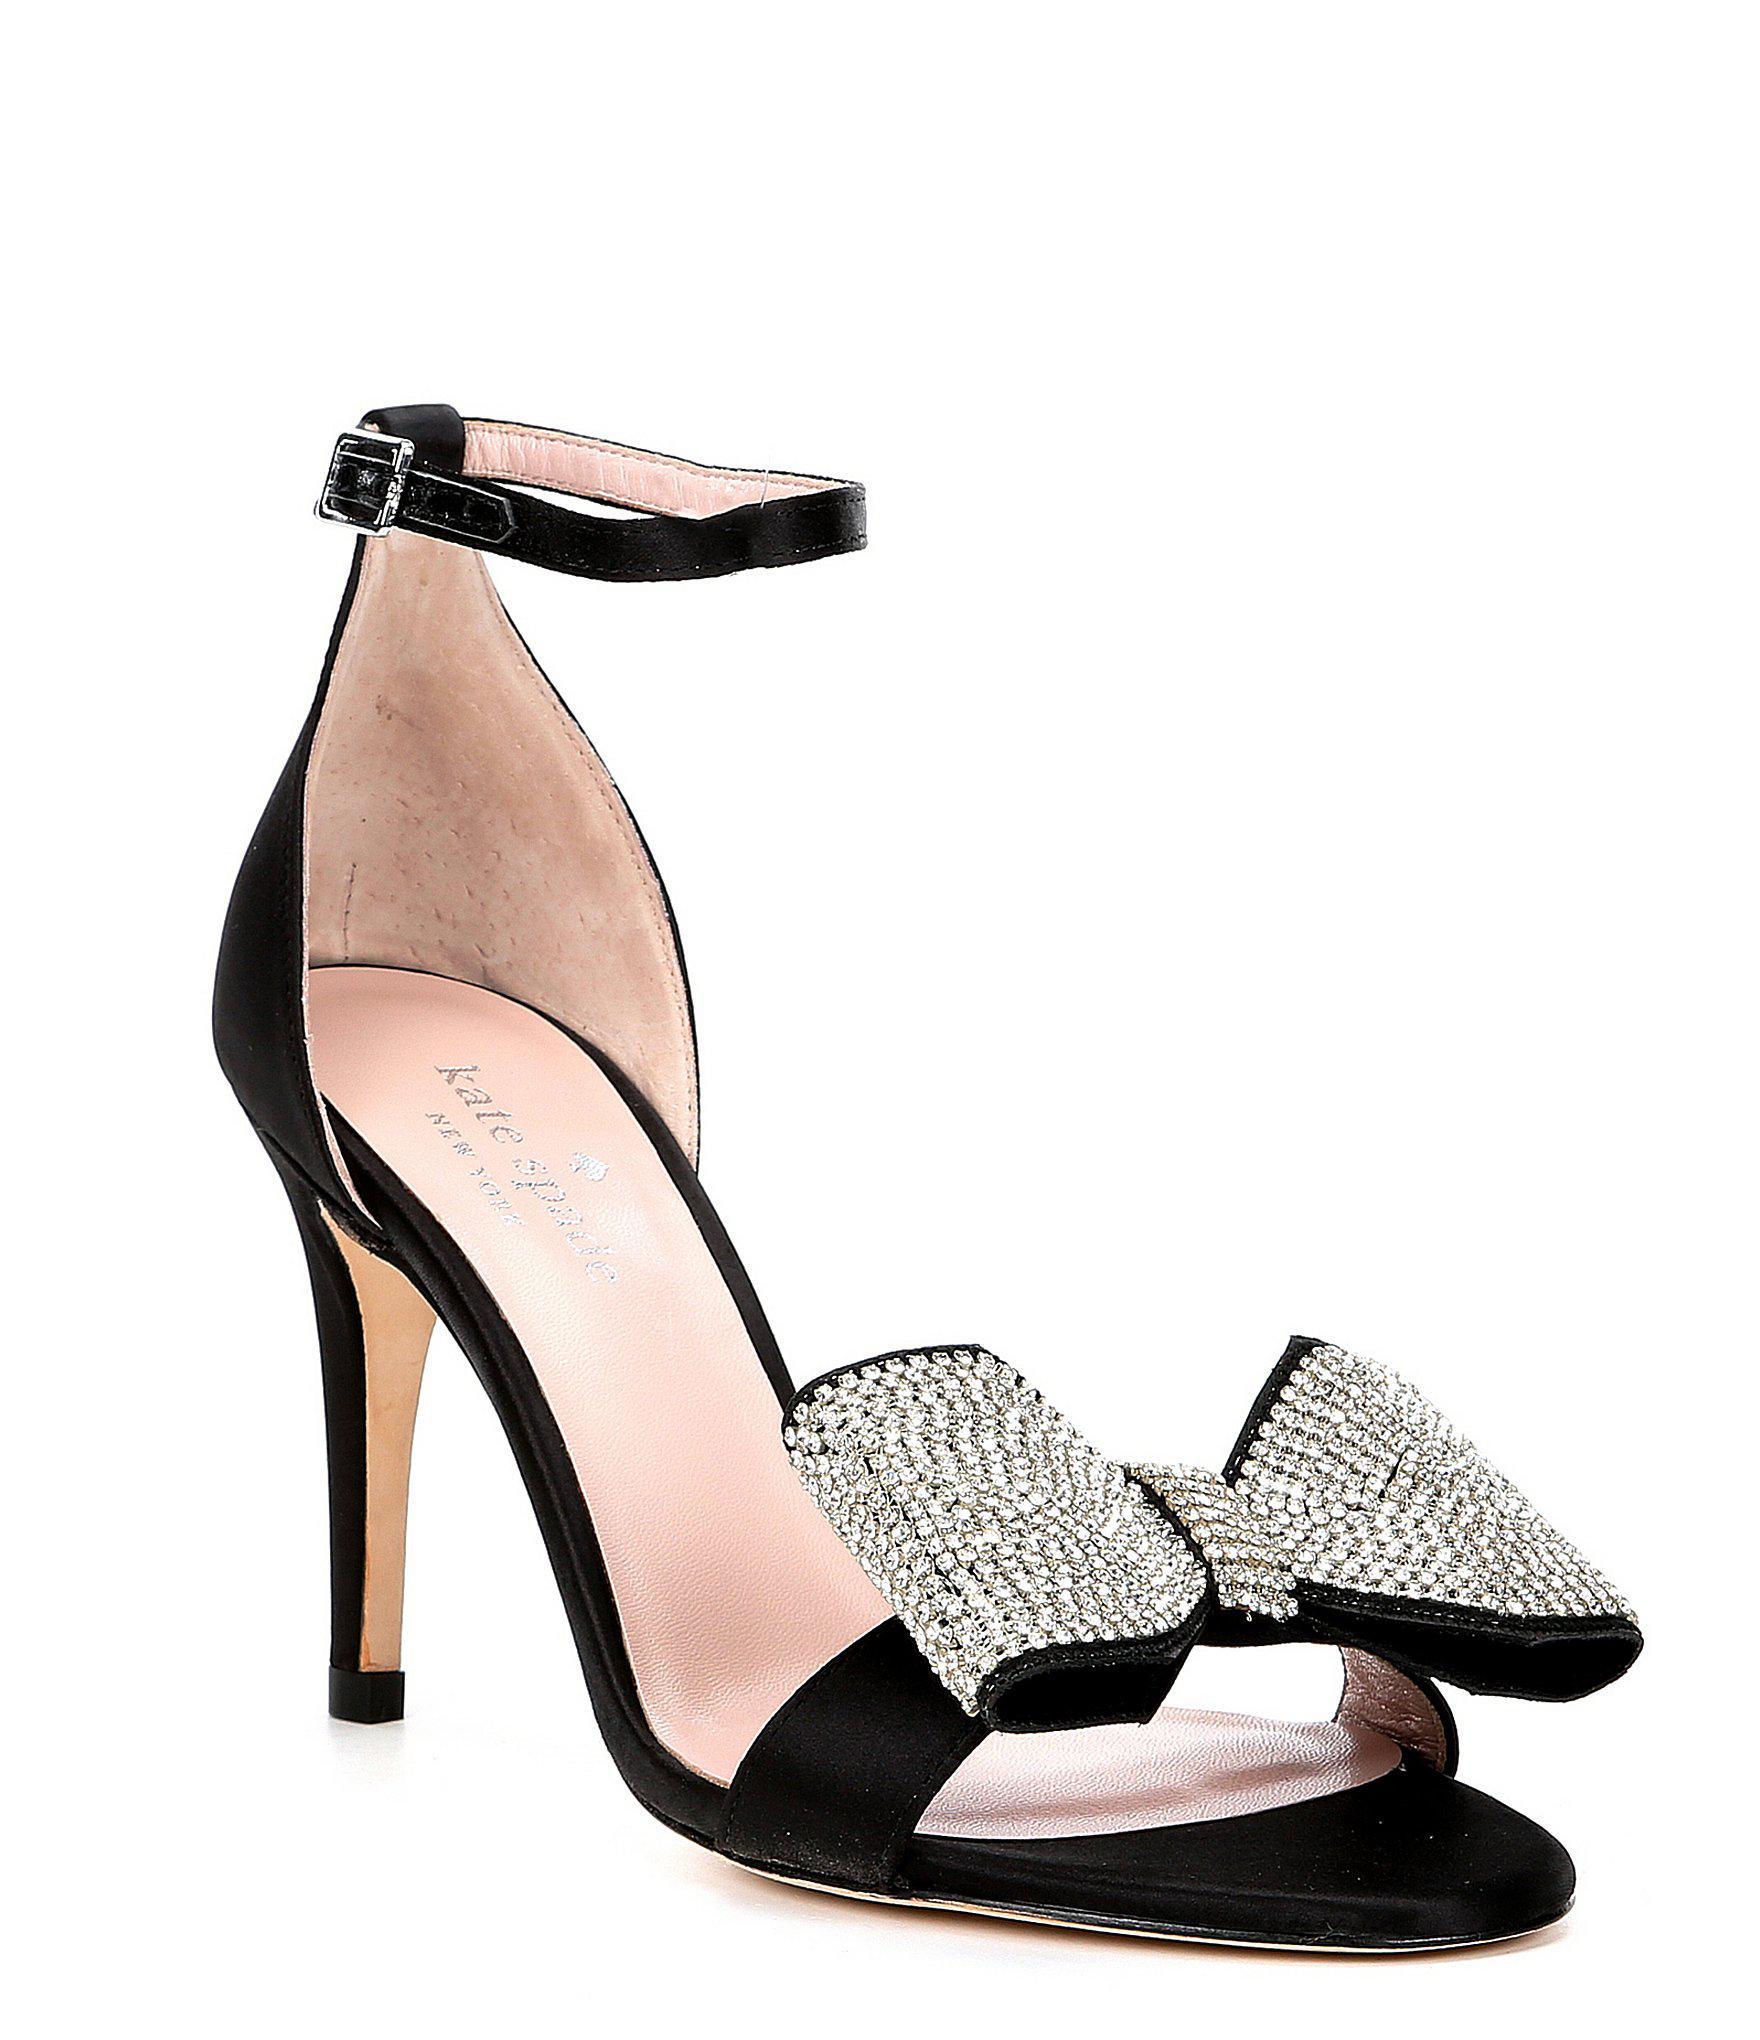 0c562c00a599 Lyst - Kate Spade Gweneth Satin Bow Dress Sandals in Black